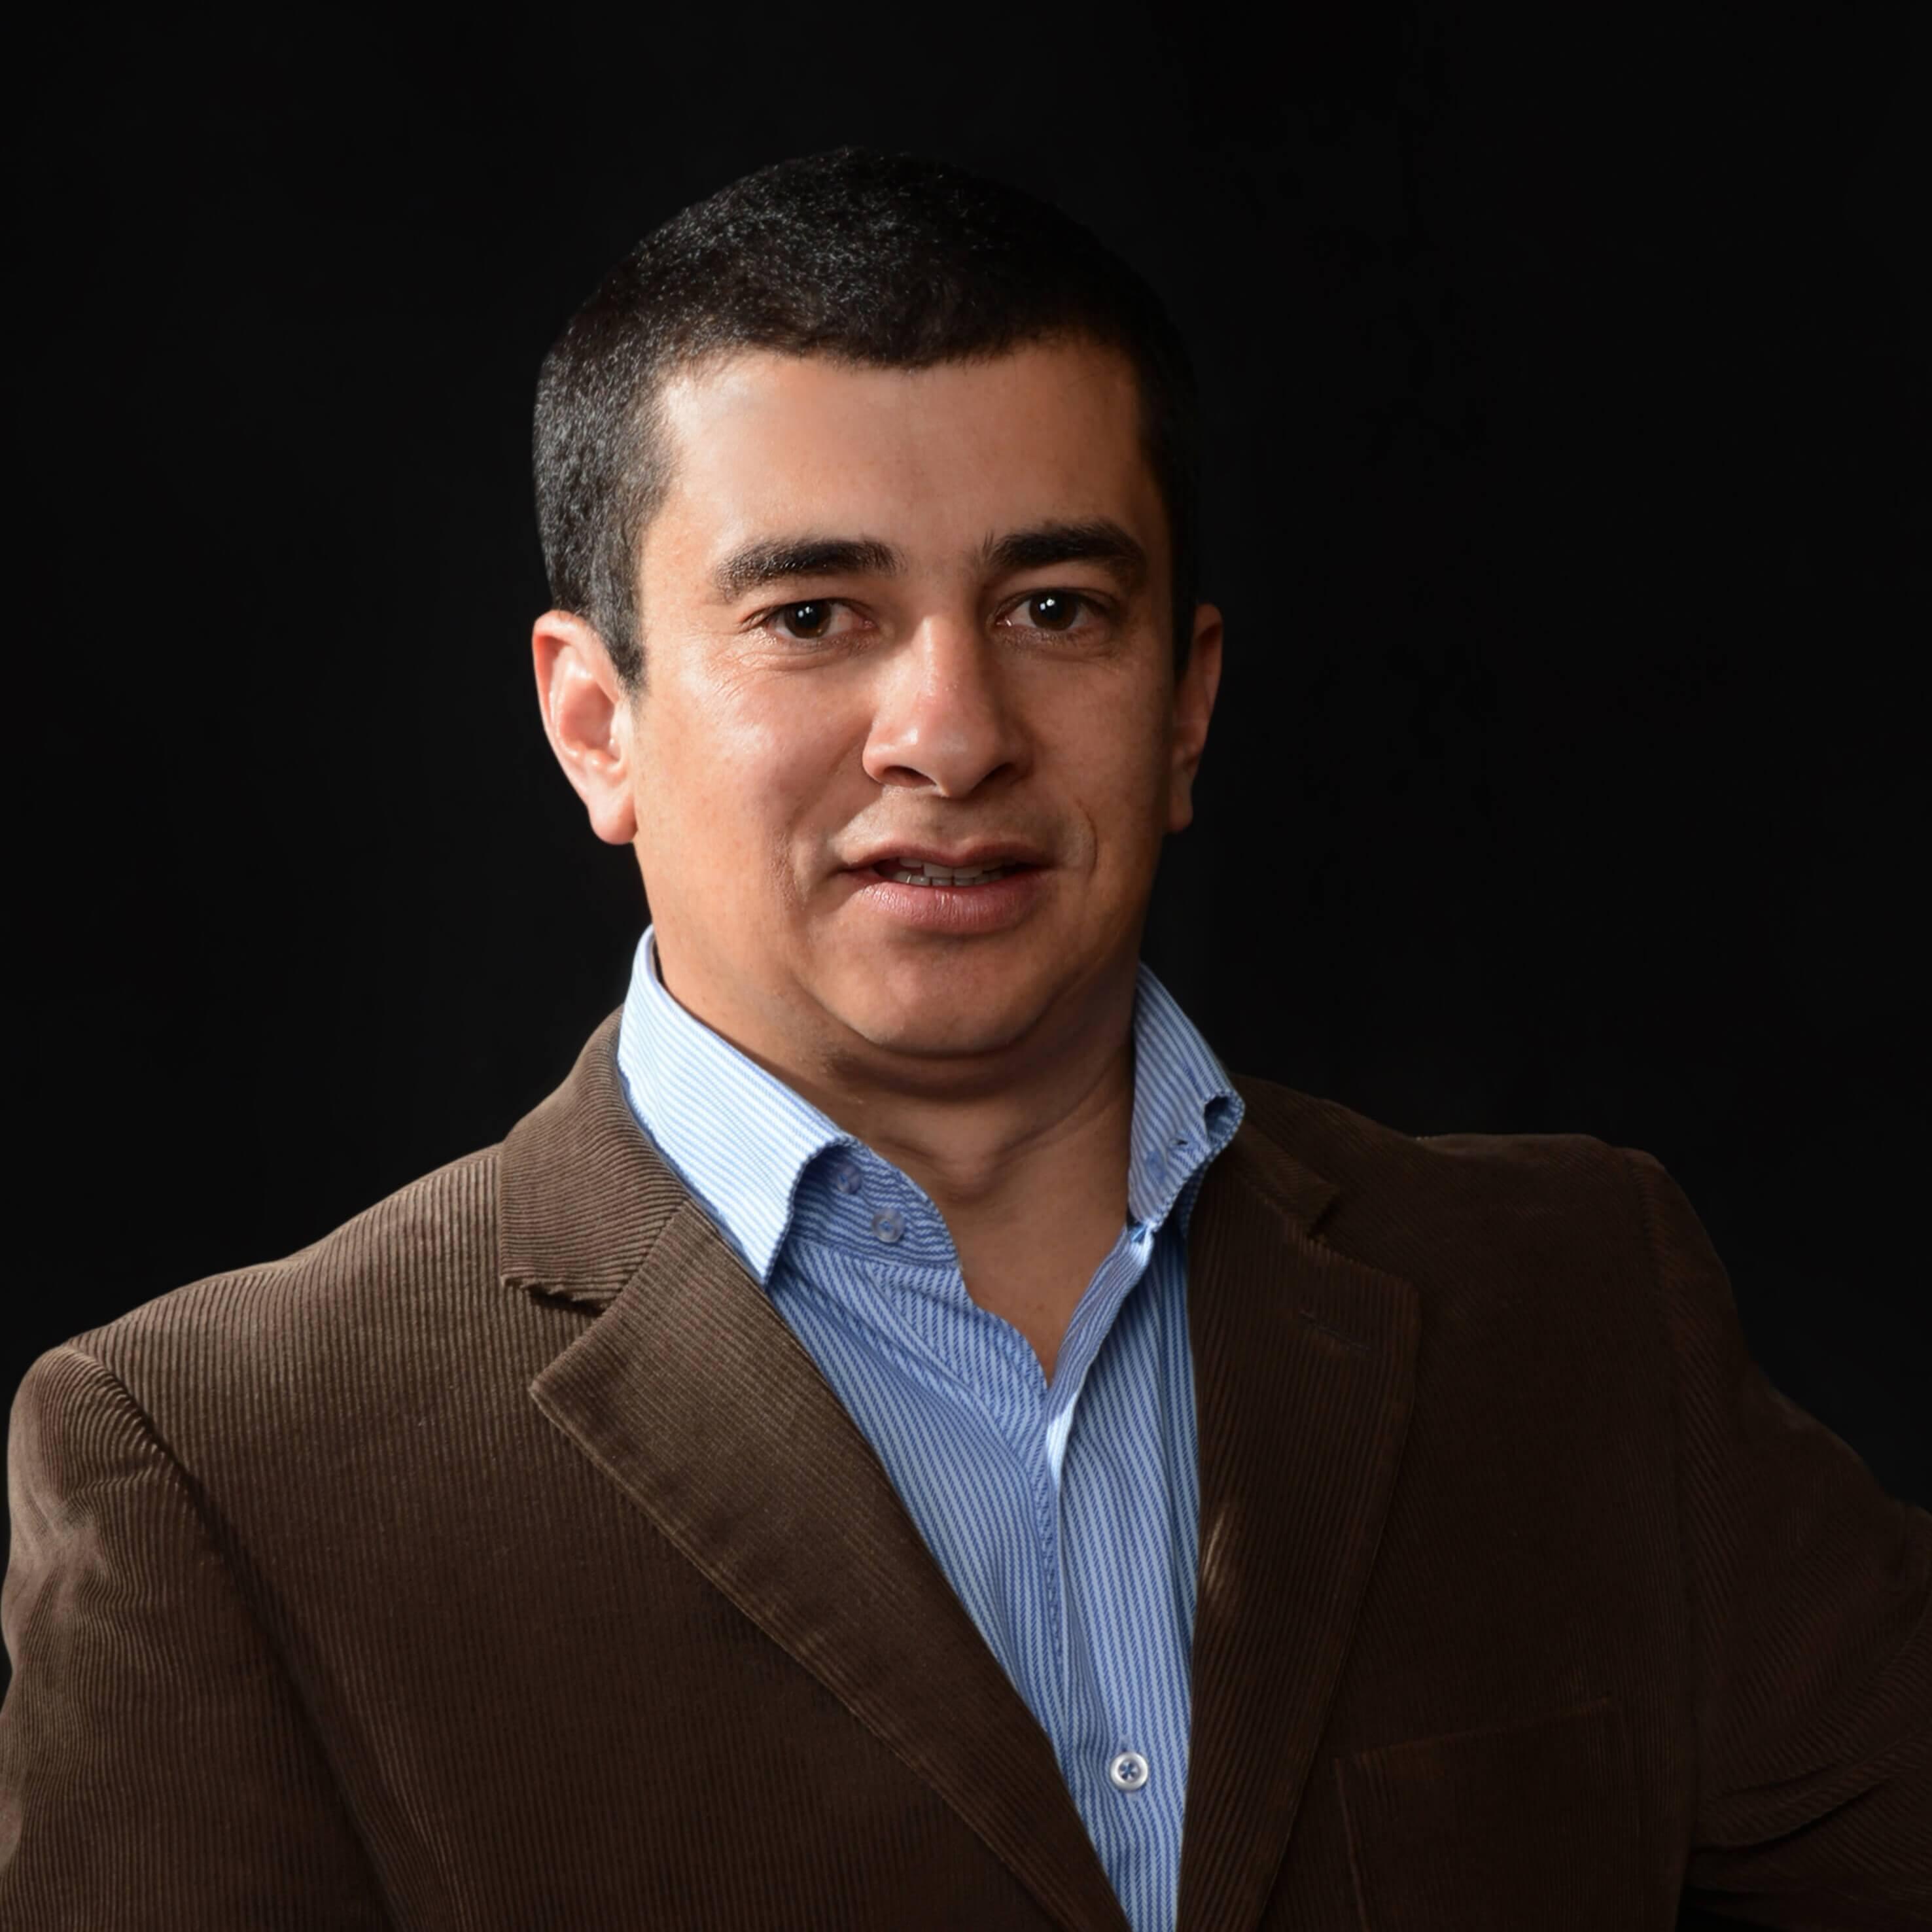 Diego Arévalo